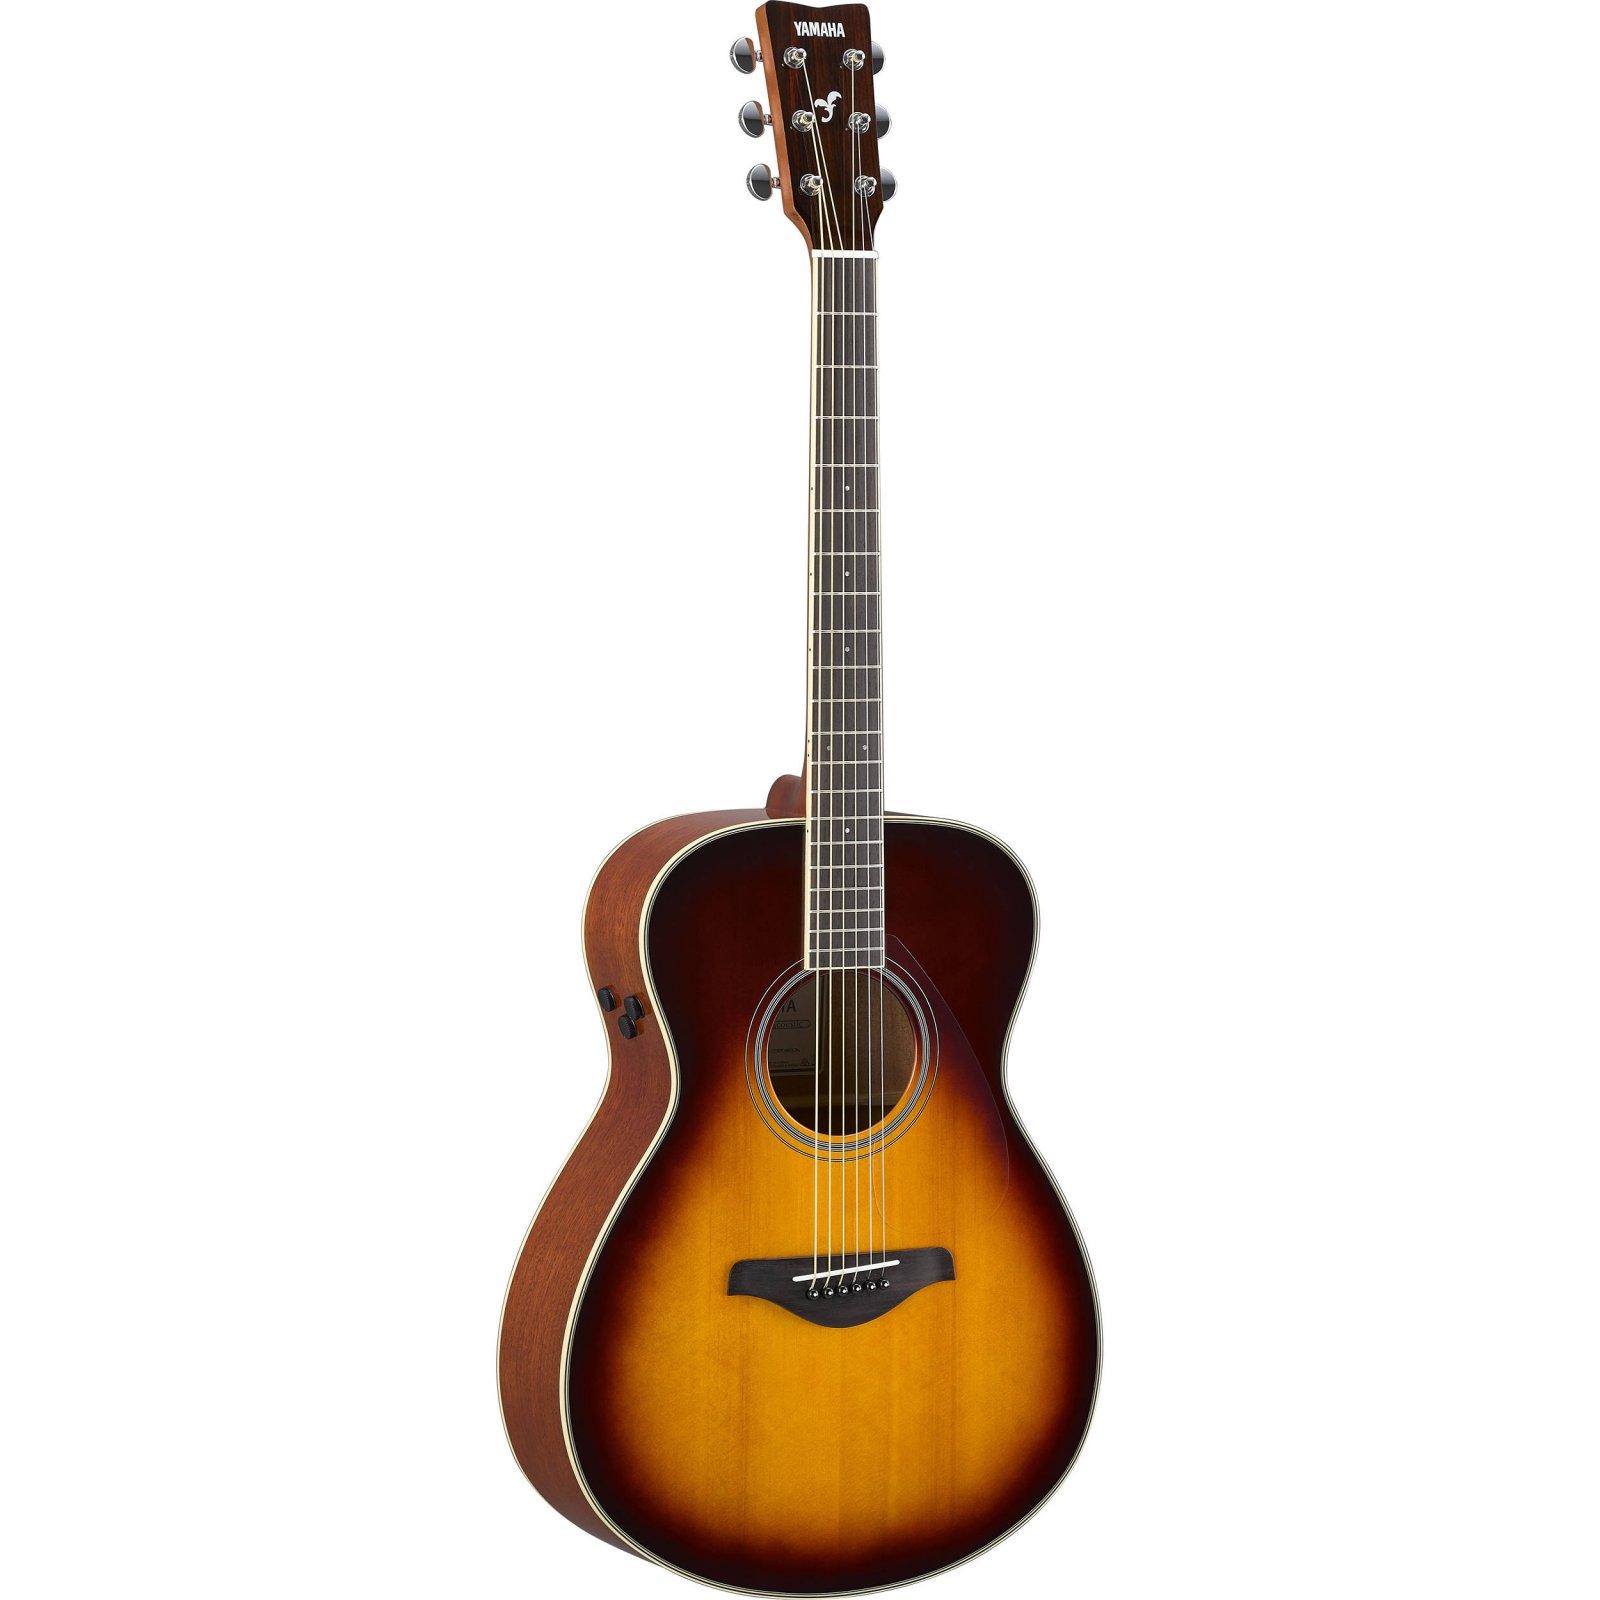 Yamaha FS-TA BS Transacoustic Acoustic-Electric Guitar Brown Sunburst